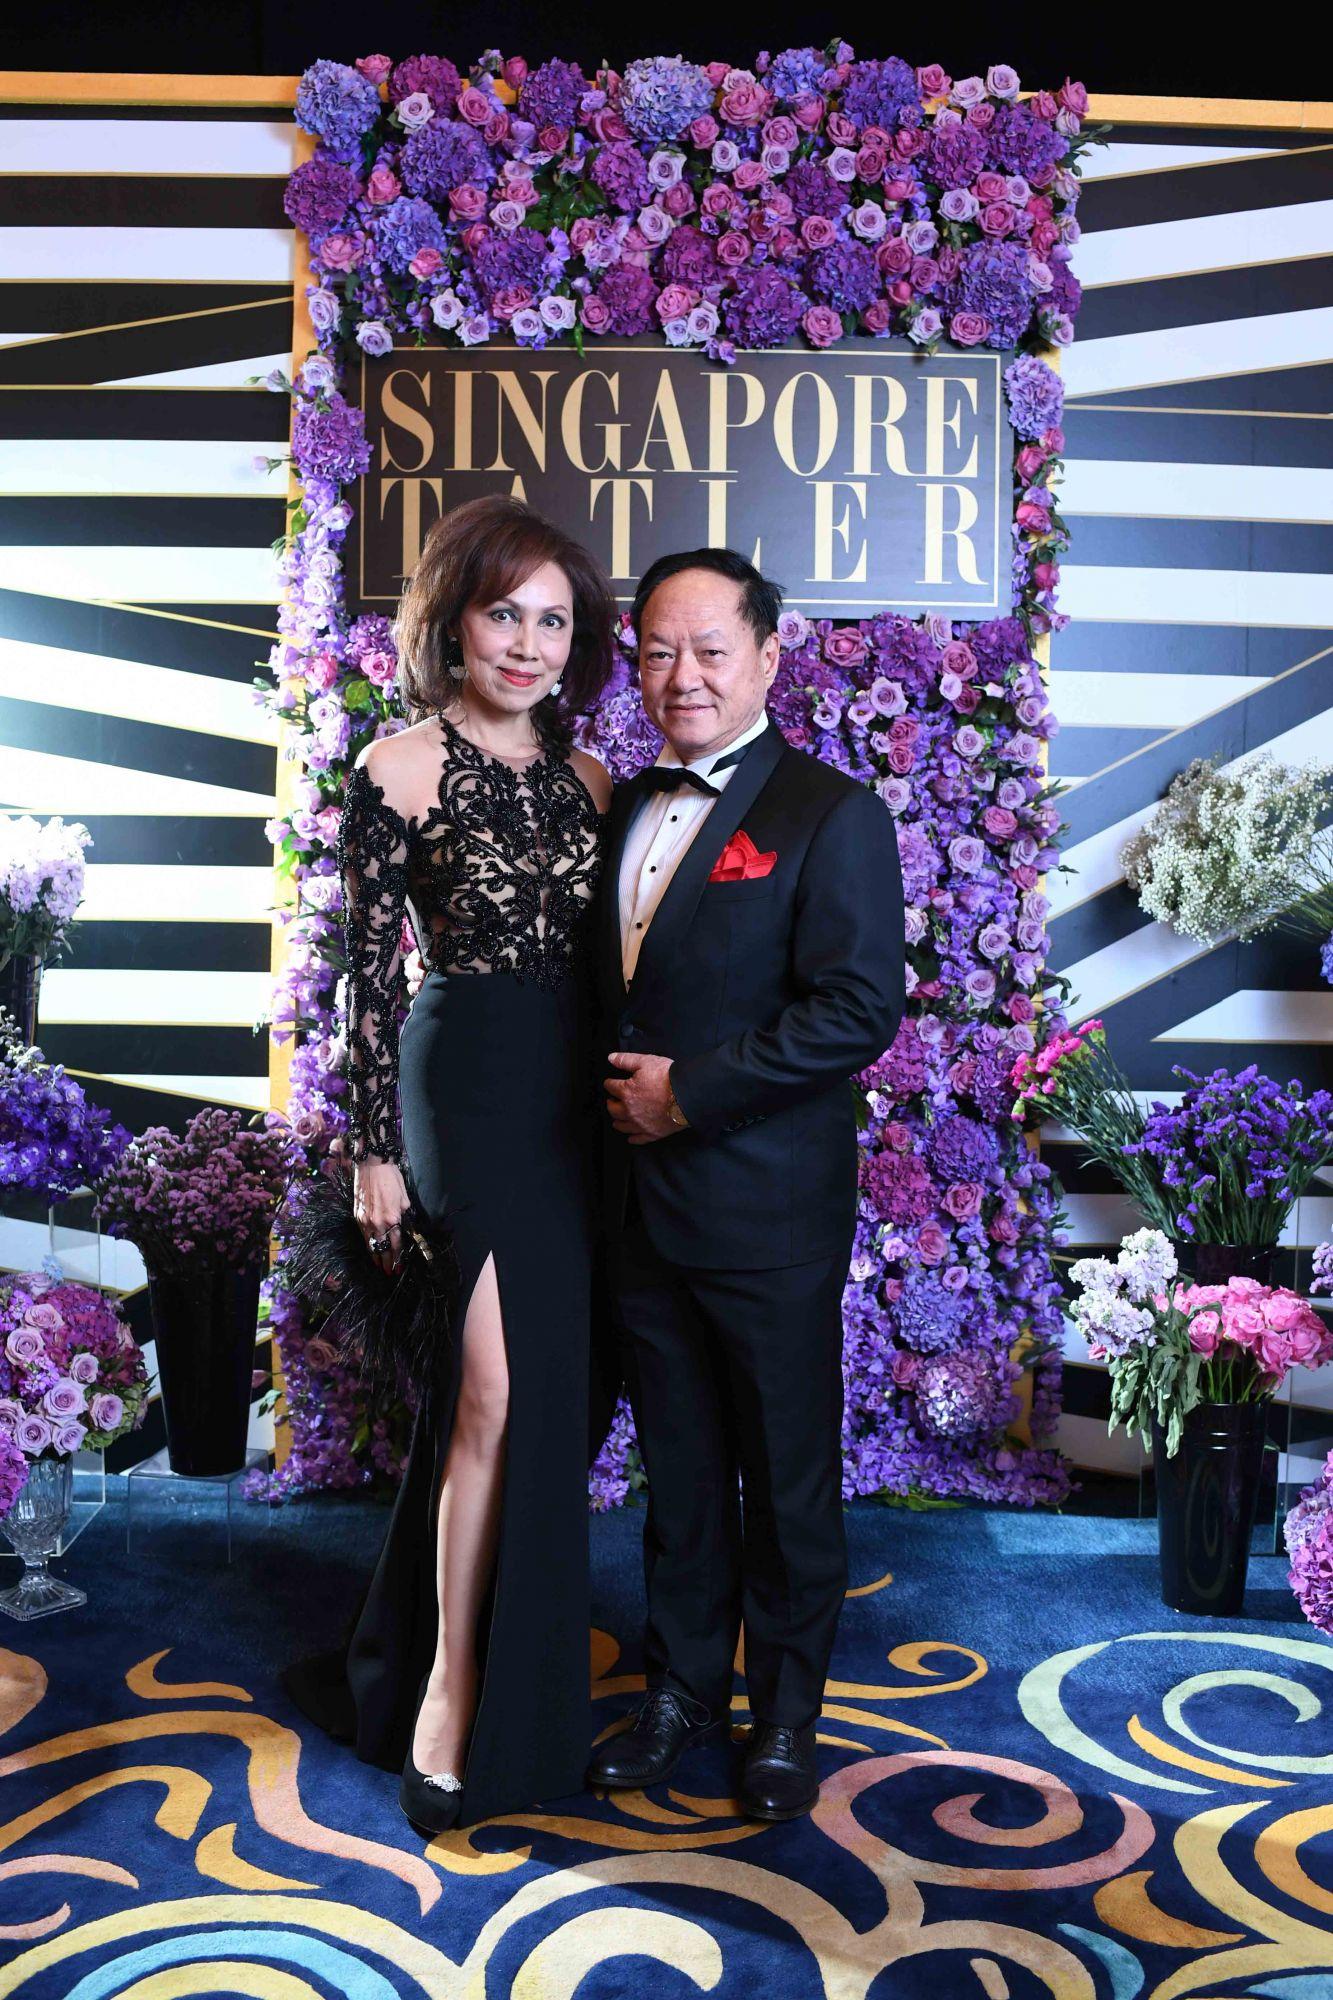 #SGTatlerBall2016: The Arrivals | Singapore Tatler